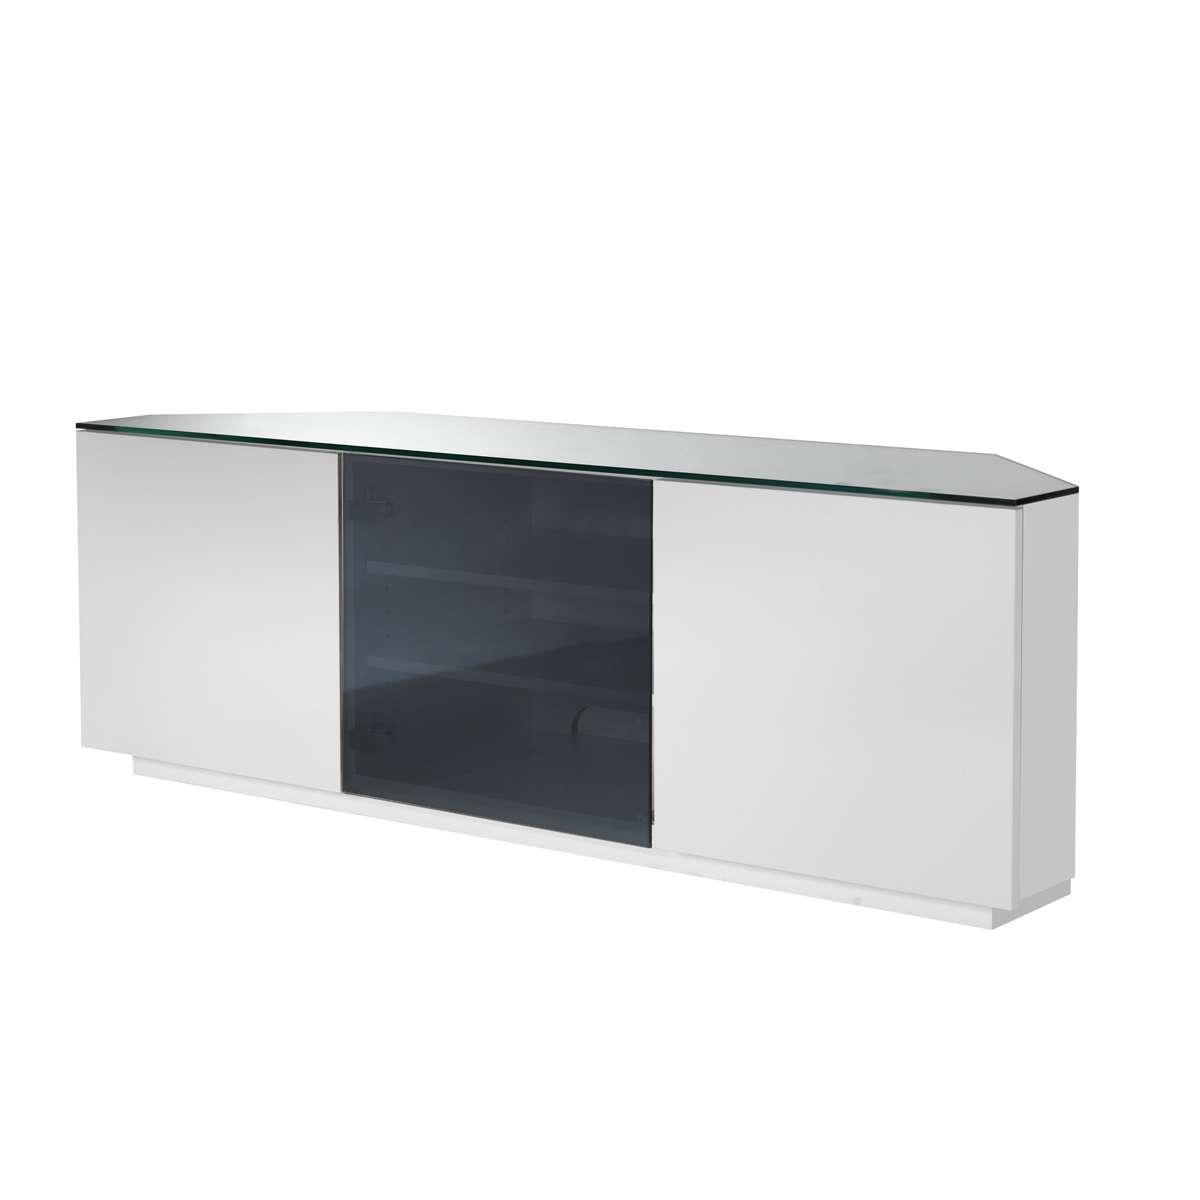 Ukcf Milan White Gloss & Black Glass Corner Tv Stand 150cm For Black Gloss Corner Tv Stands (View 5 of 15)